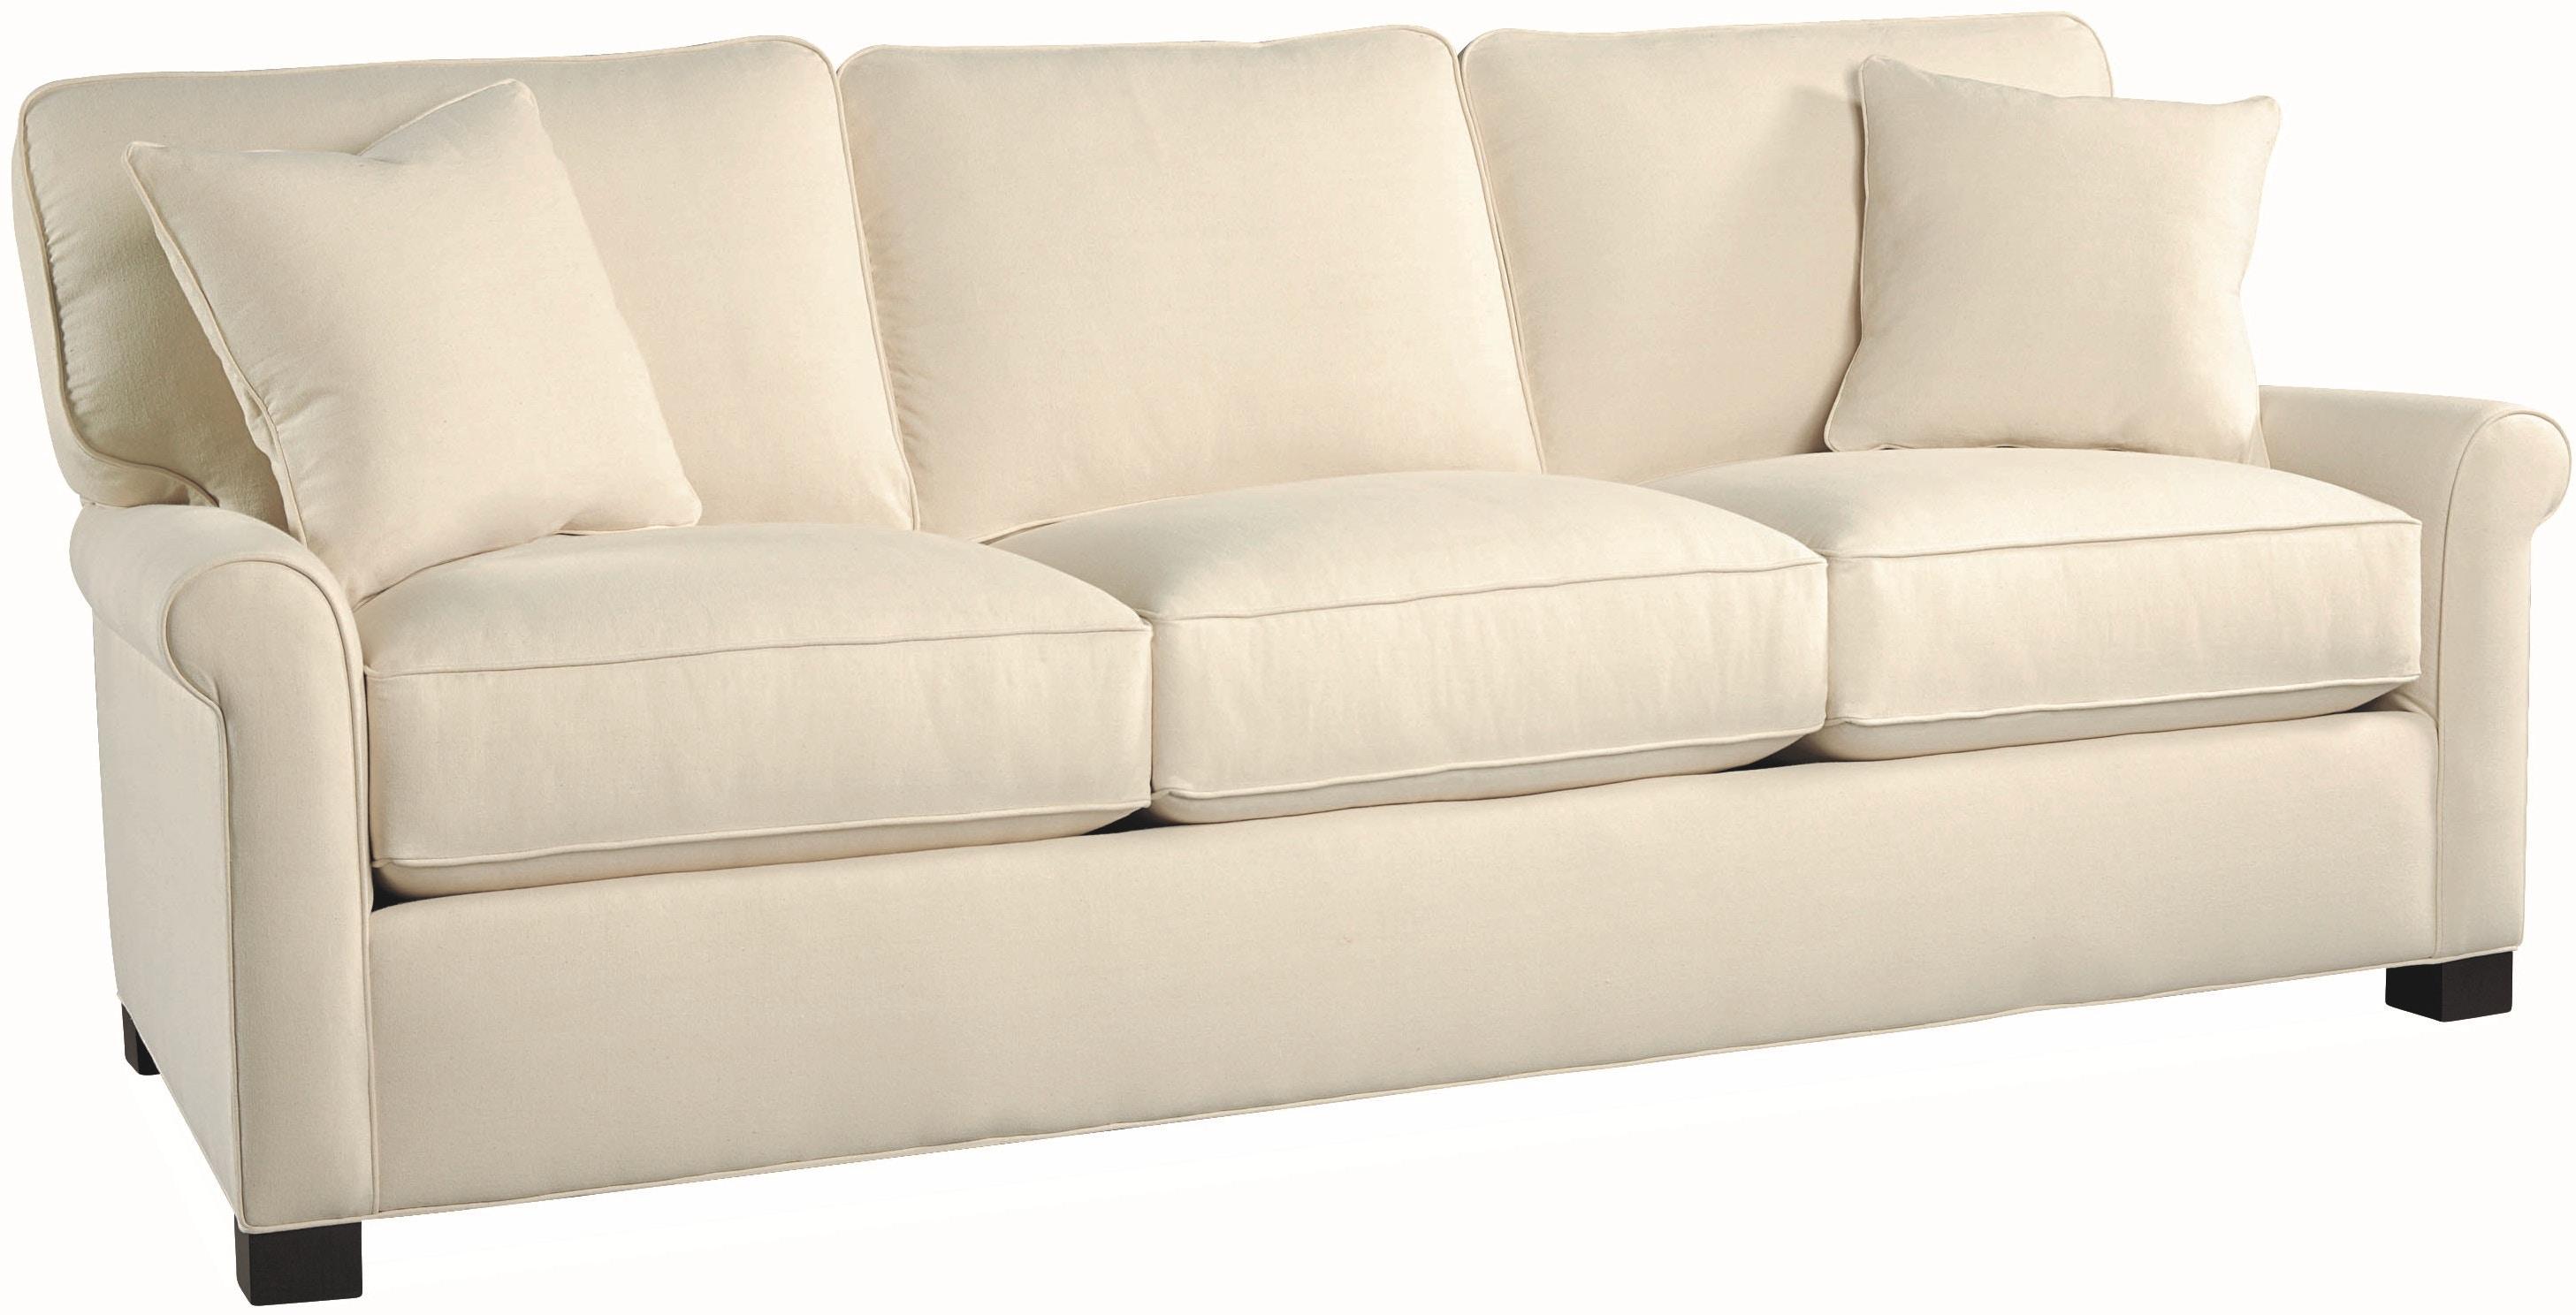 Lee Industries Living Room Sofa 5632 03 R W Design